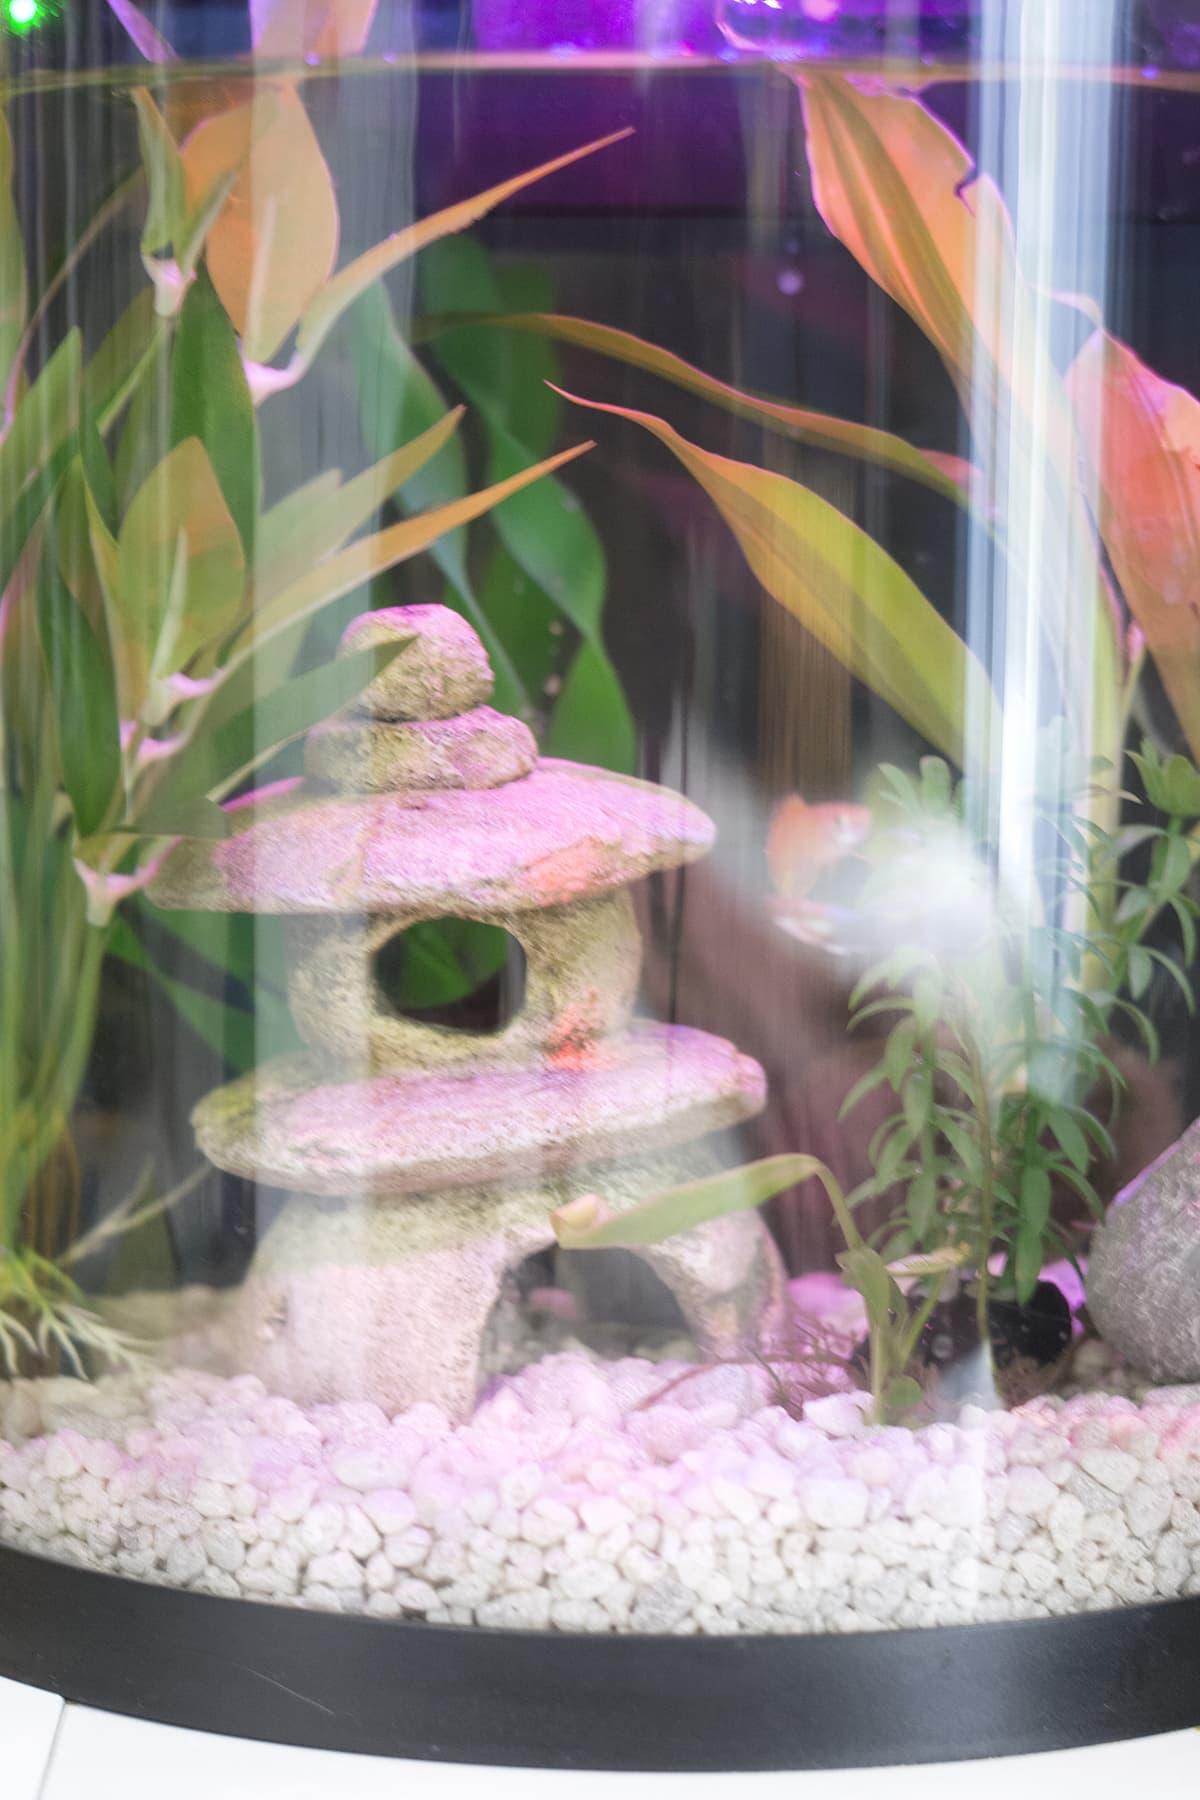 aquarium in my daughter's bedroom